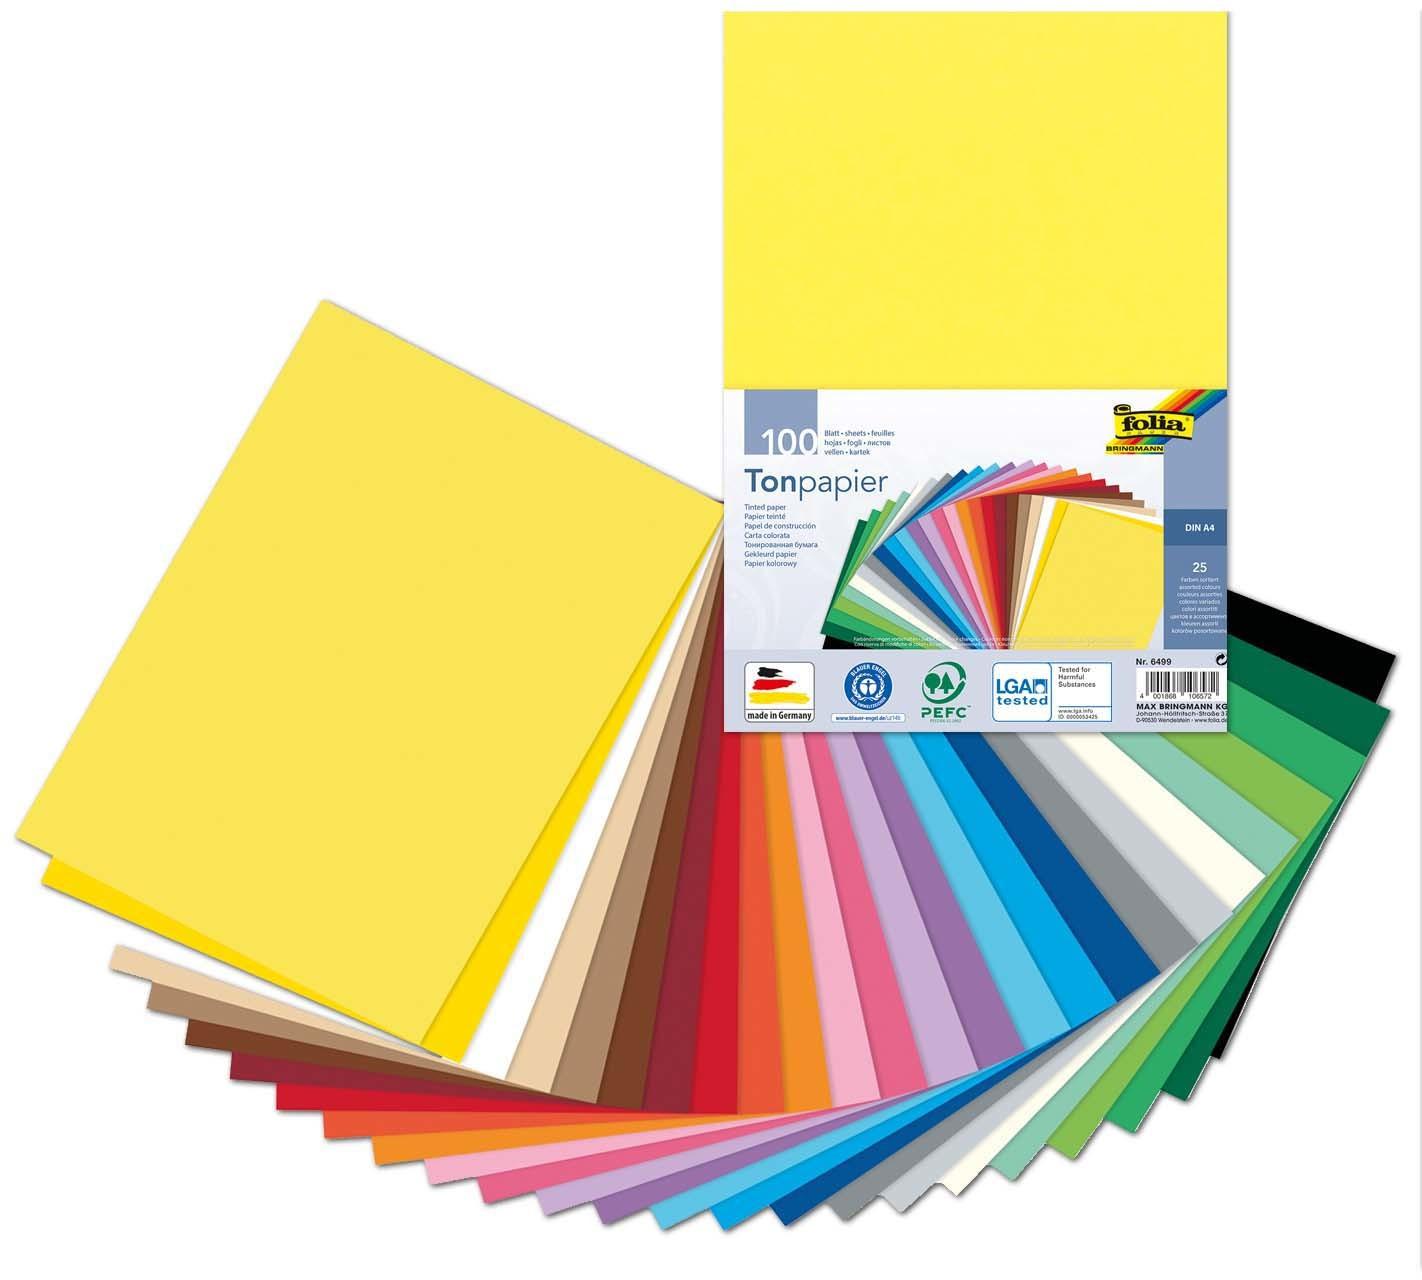 100 Blatt Tonpapier Din A4 - Bunt für Gemustertes Tonpapier